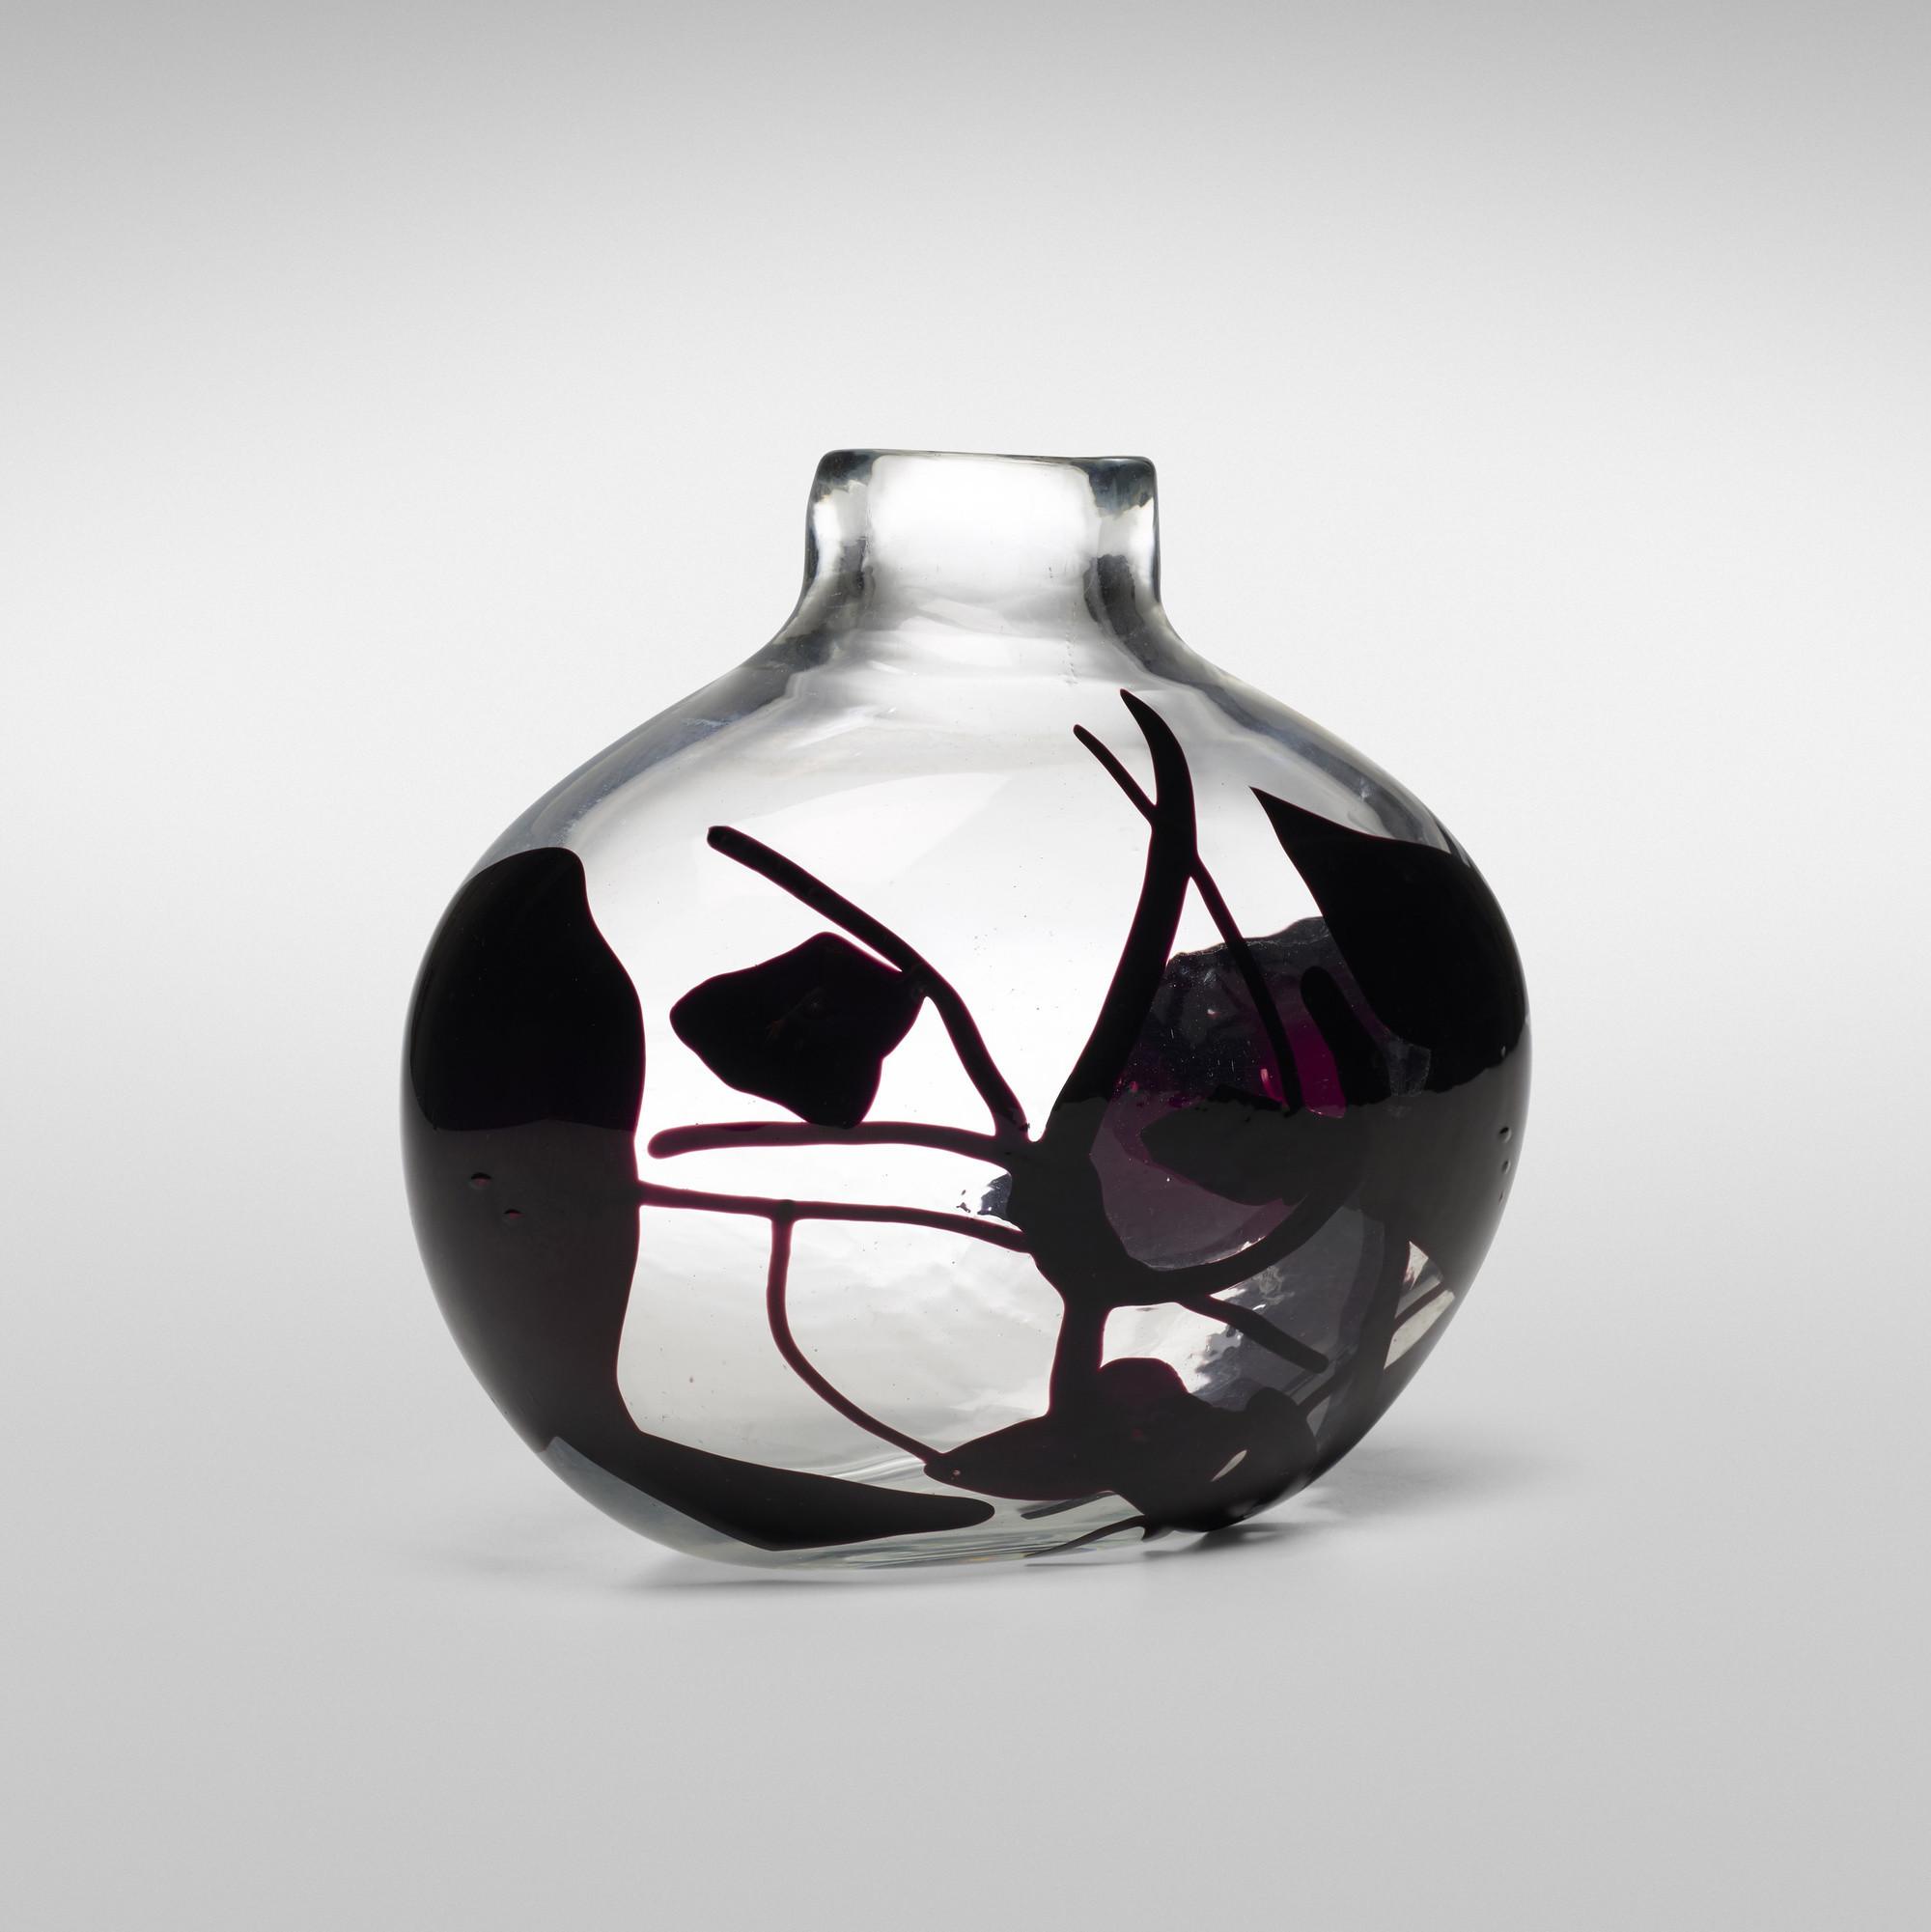 big clear glass vase of 139 fulvio bianconi important con macchie vase model 4324 with regard to 139 fulvio bianconi important con macchie vase model 4324 2 of 4